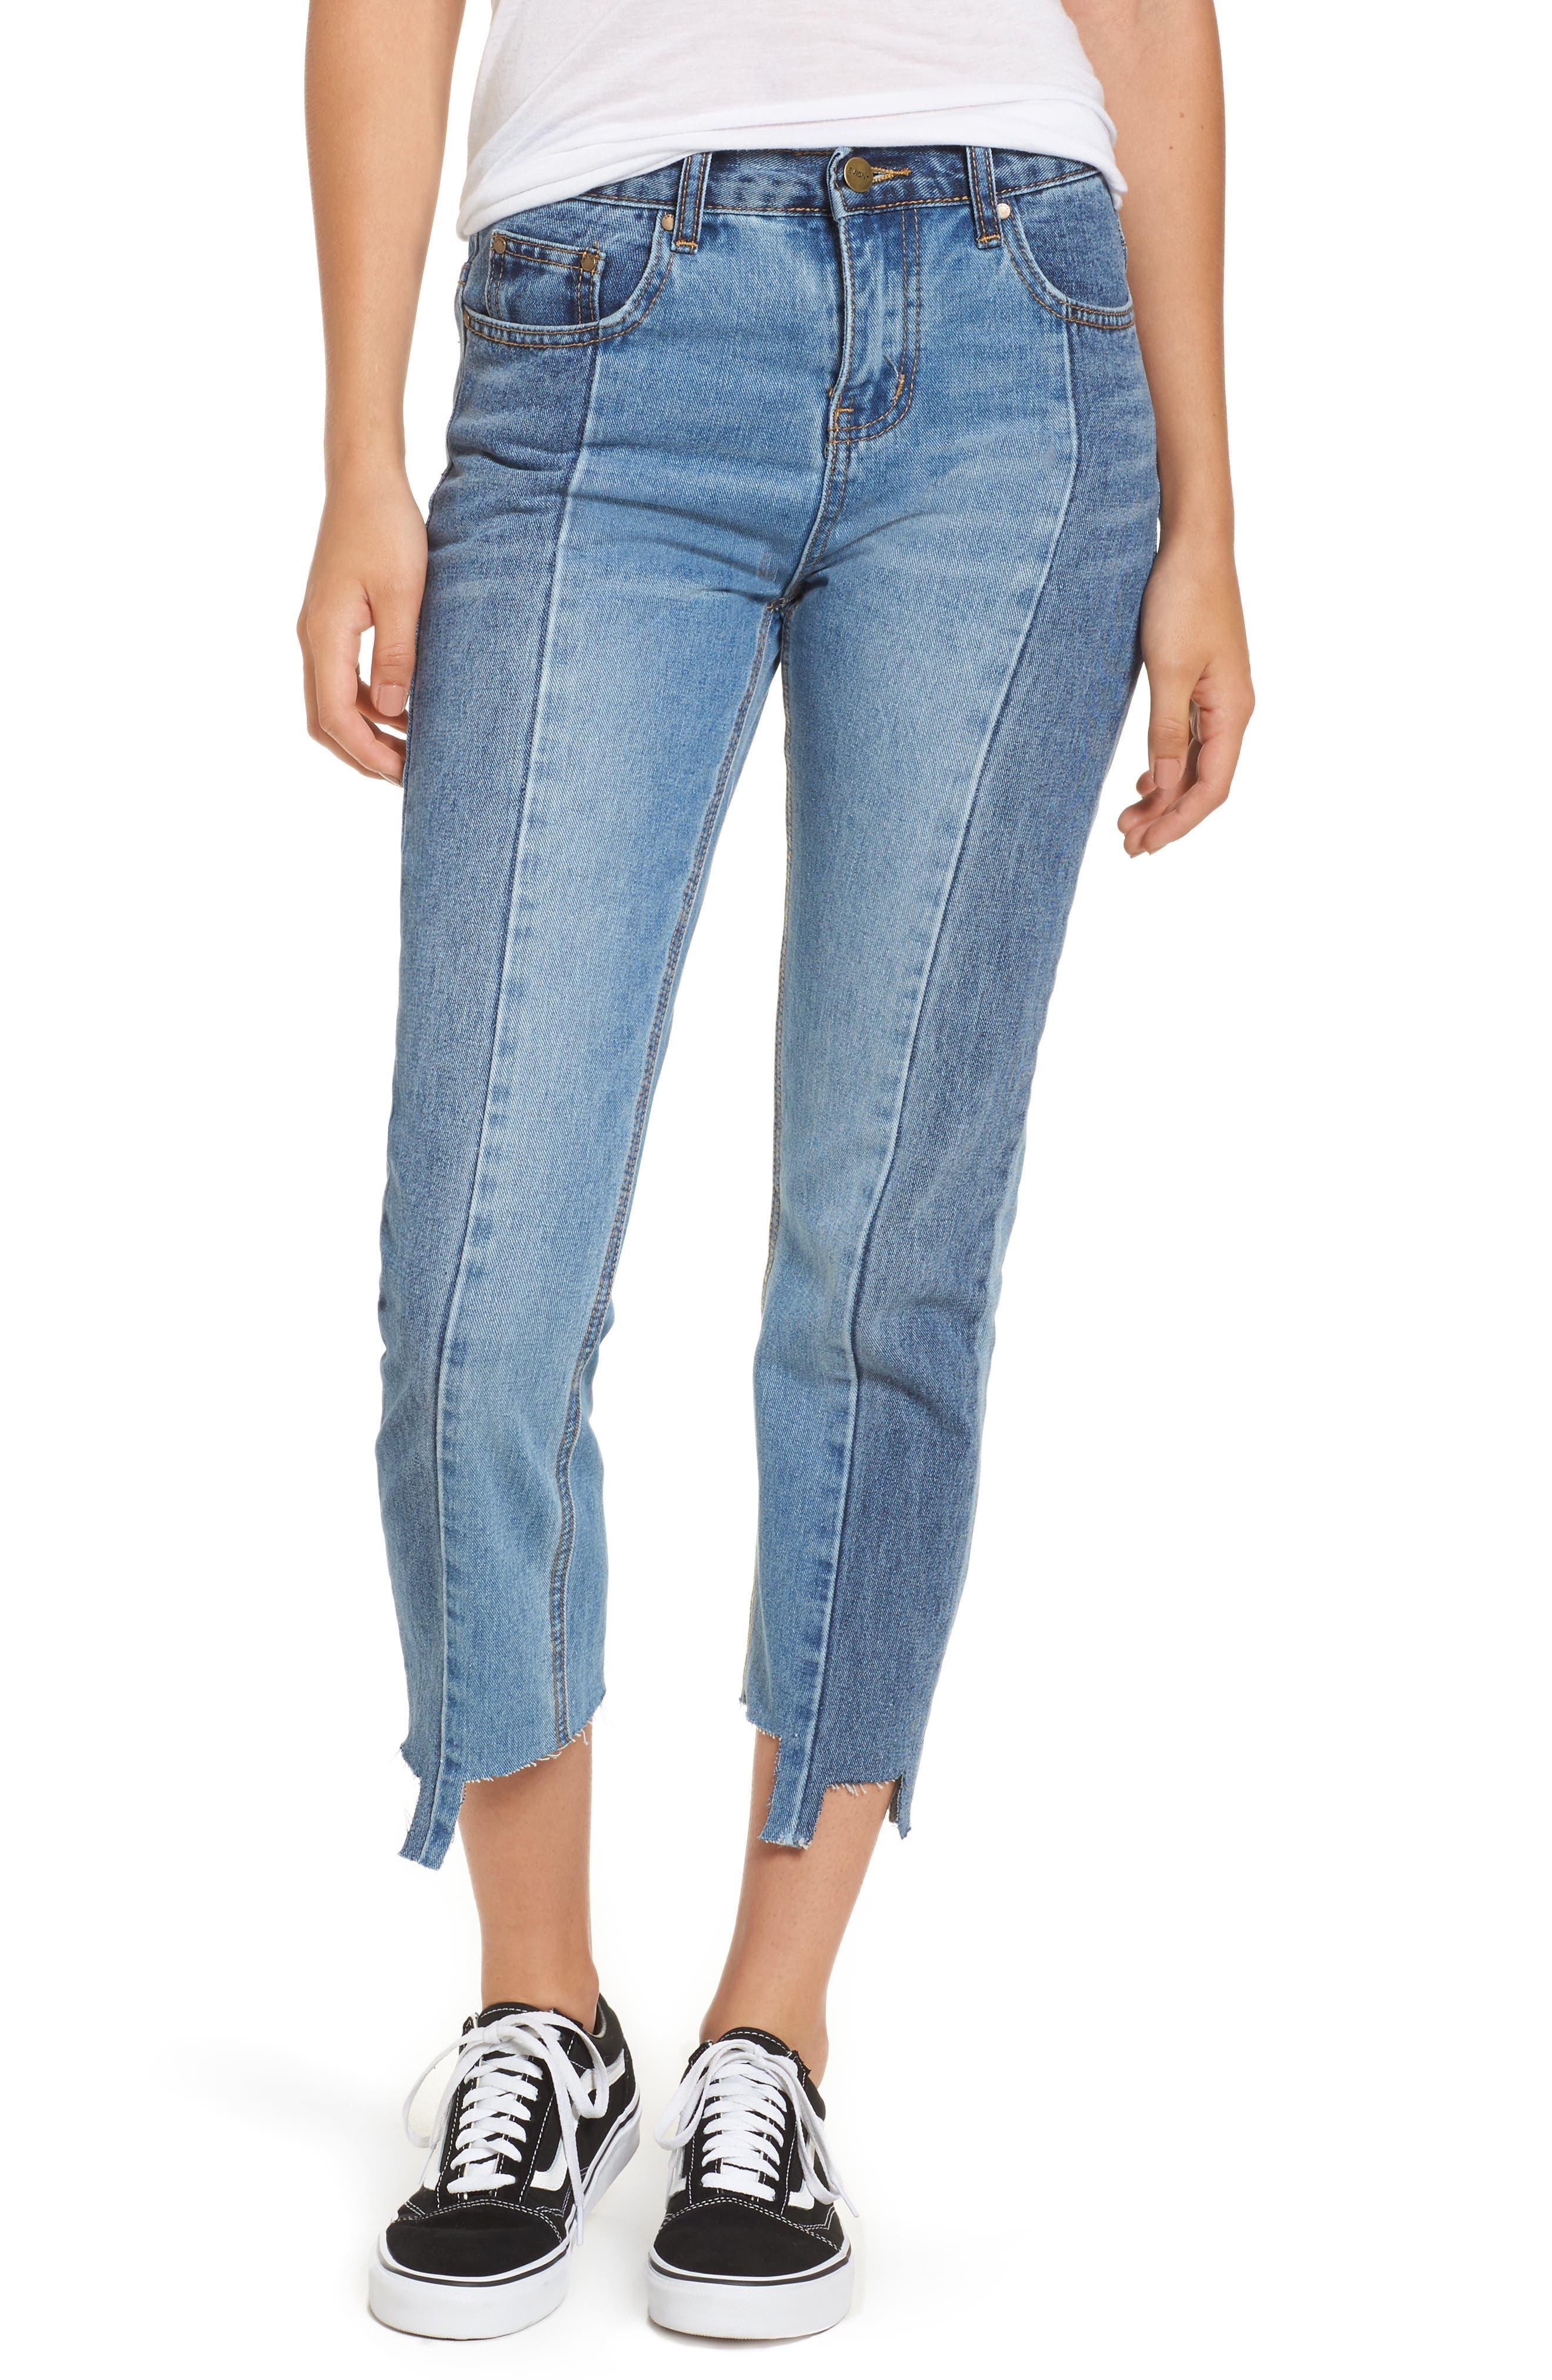 EVIDNT Patchwork Crop Skinny Jeans